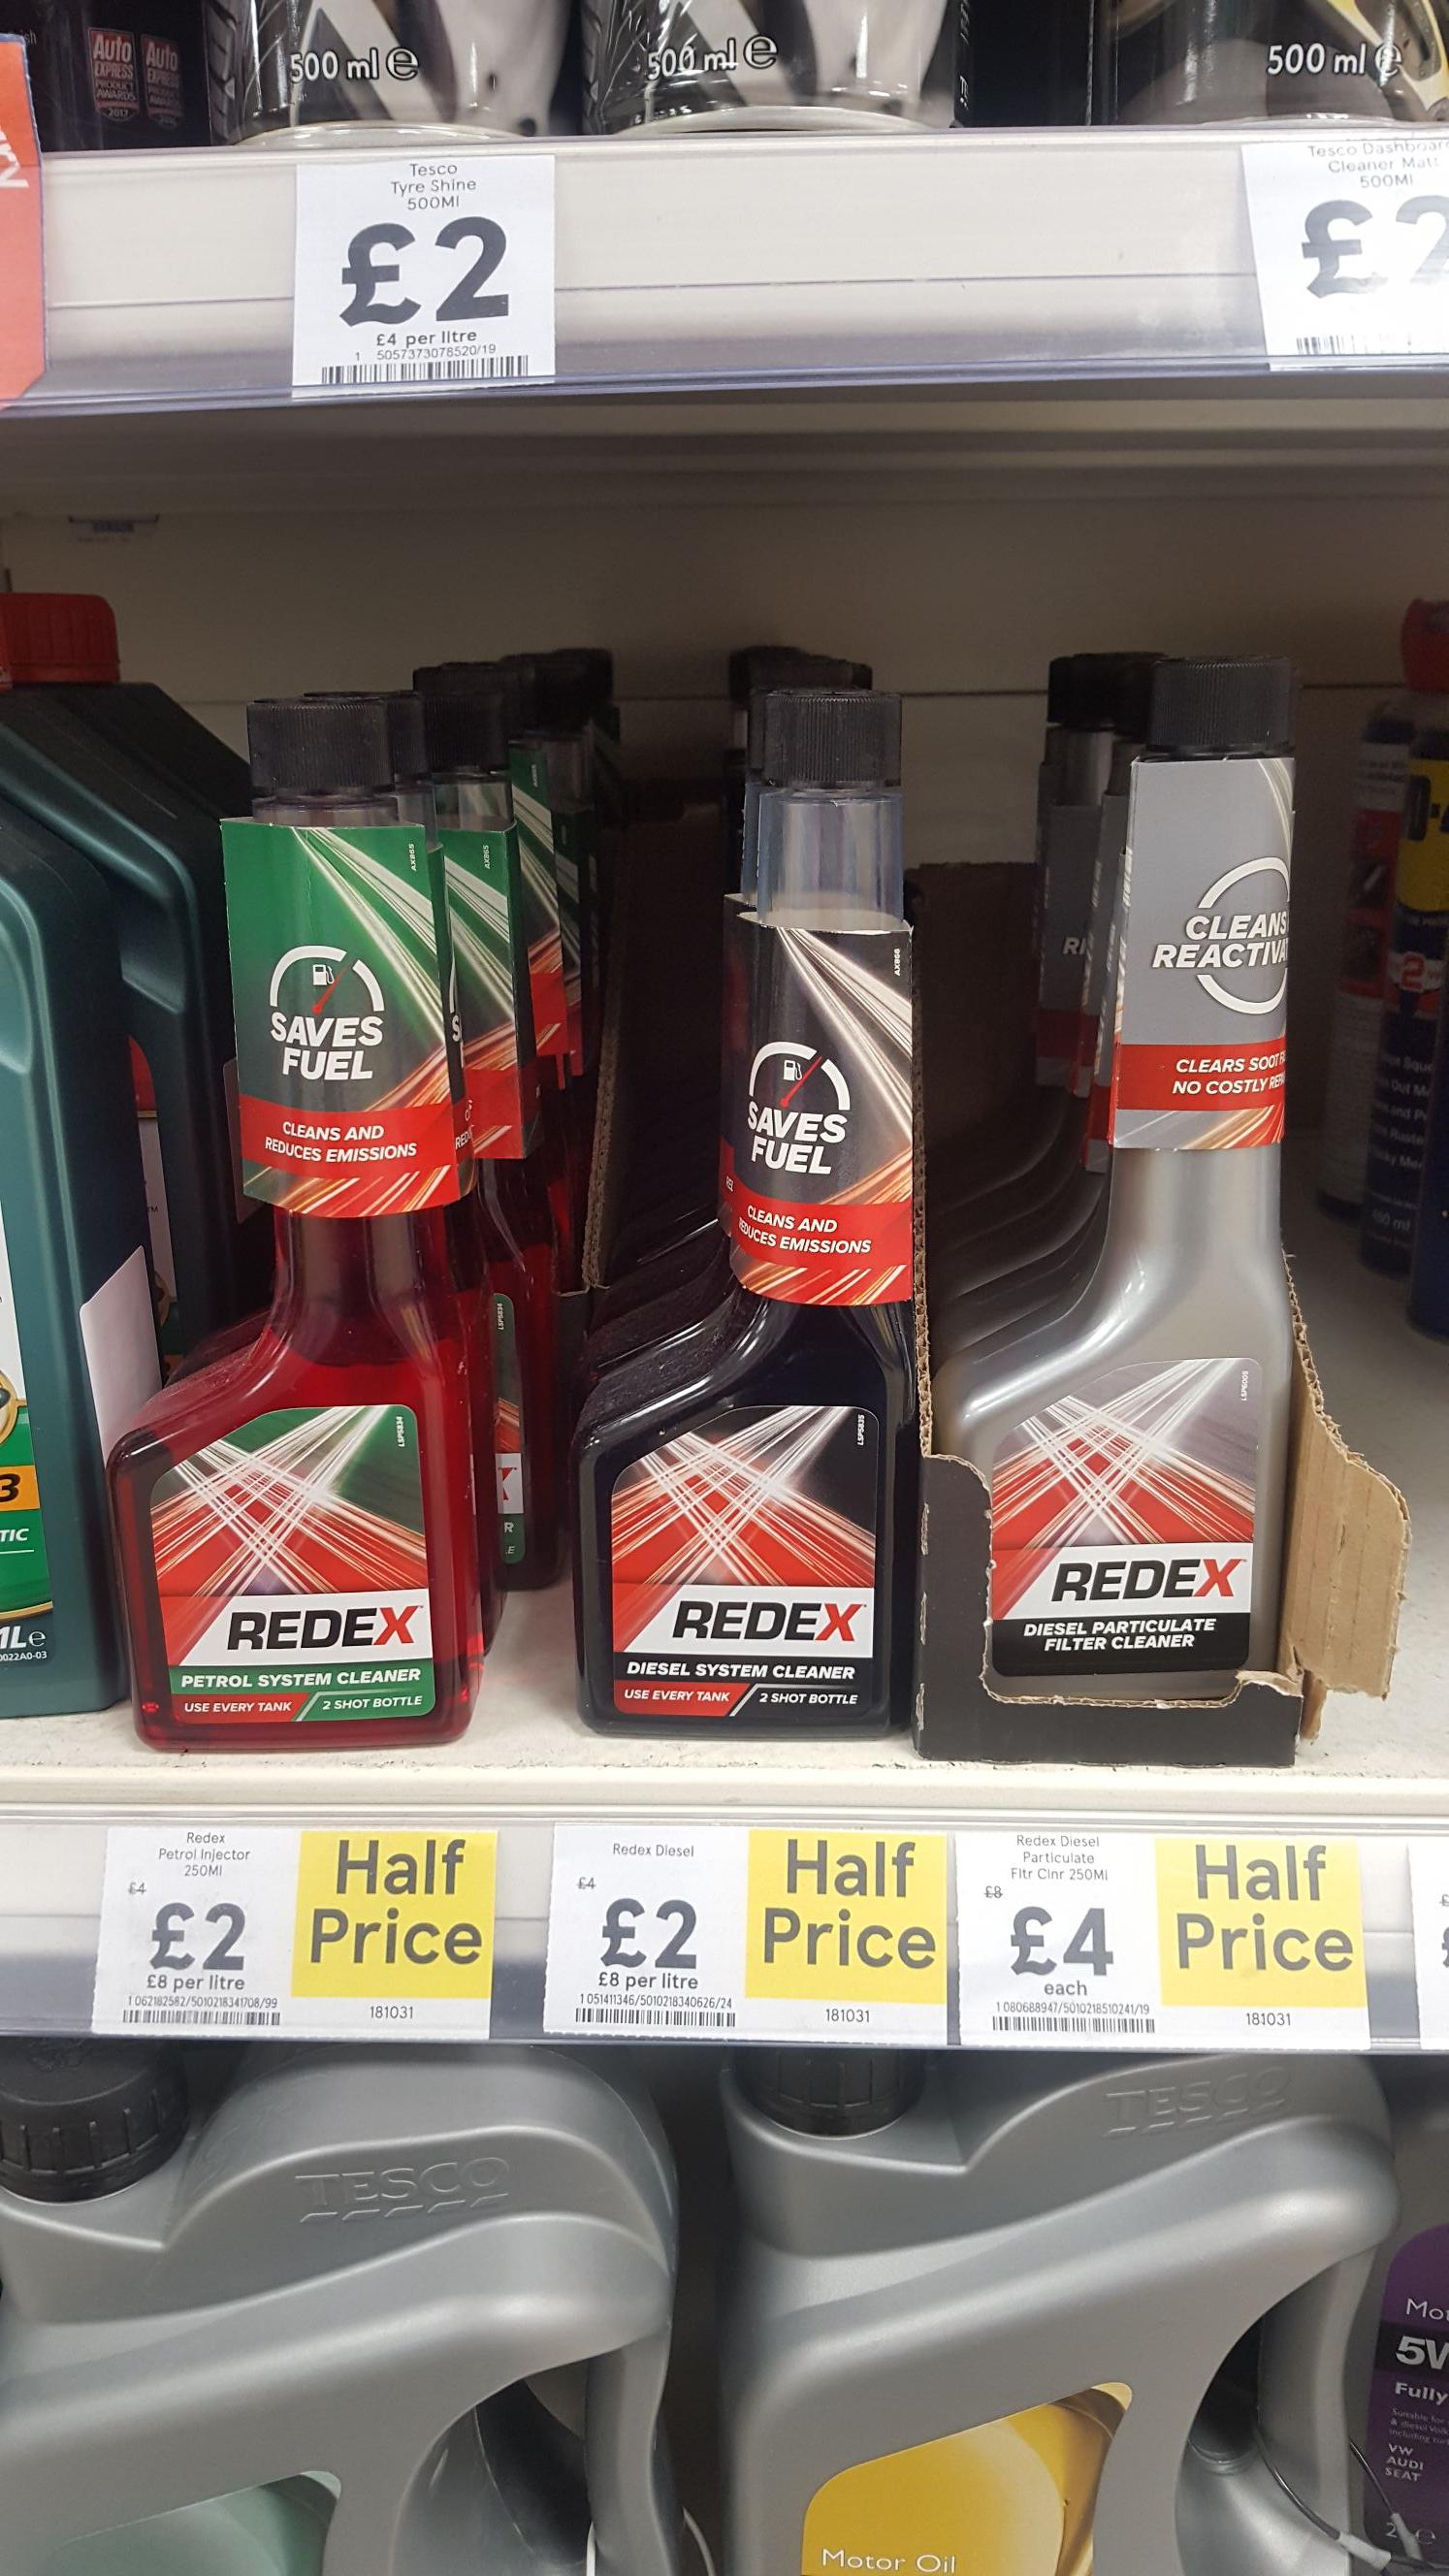 Redex DPF cleaner half price sale - £4 instore @ Tesco